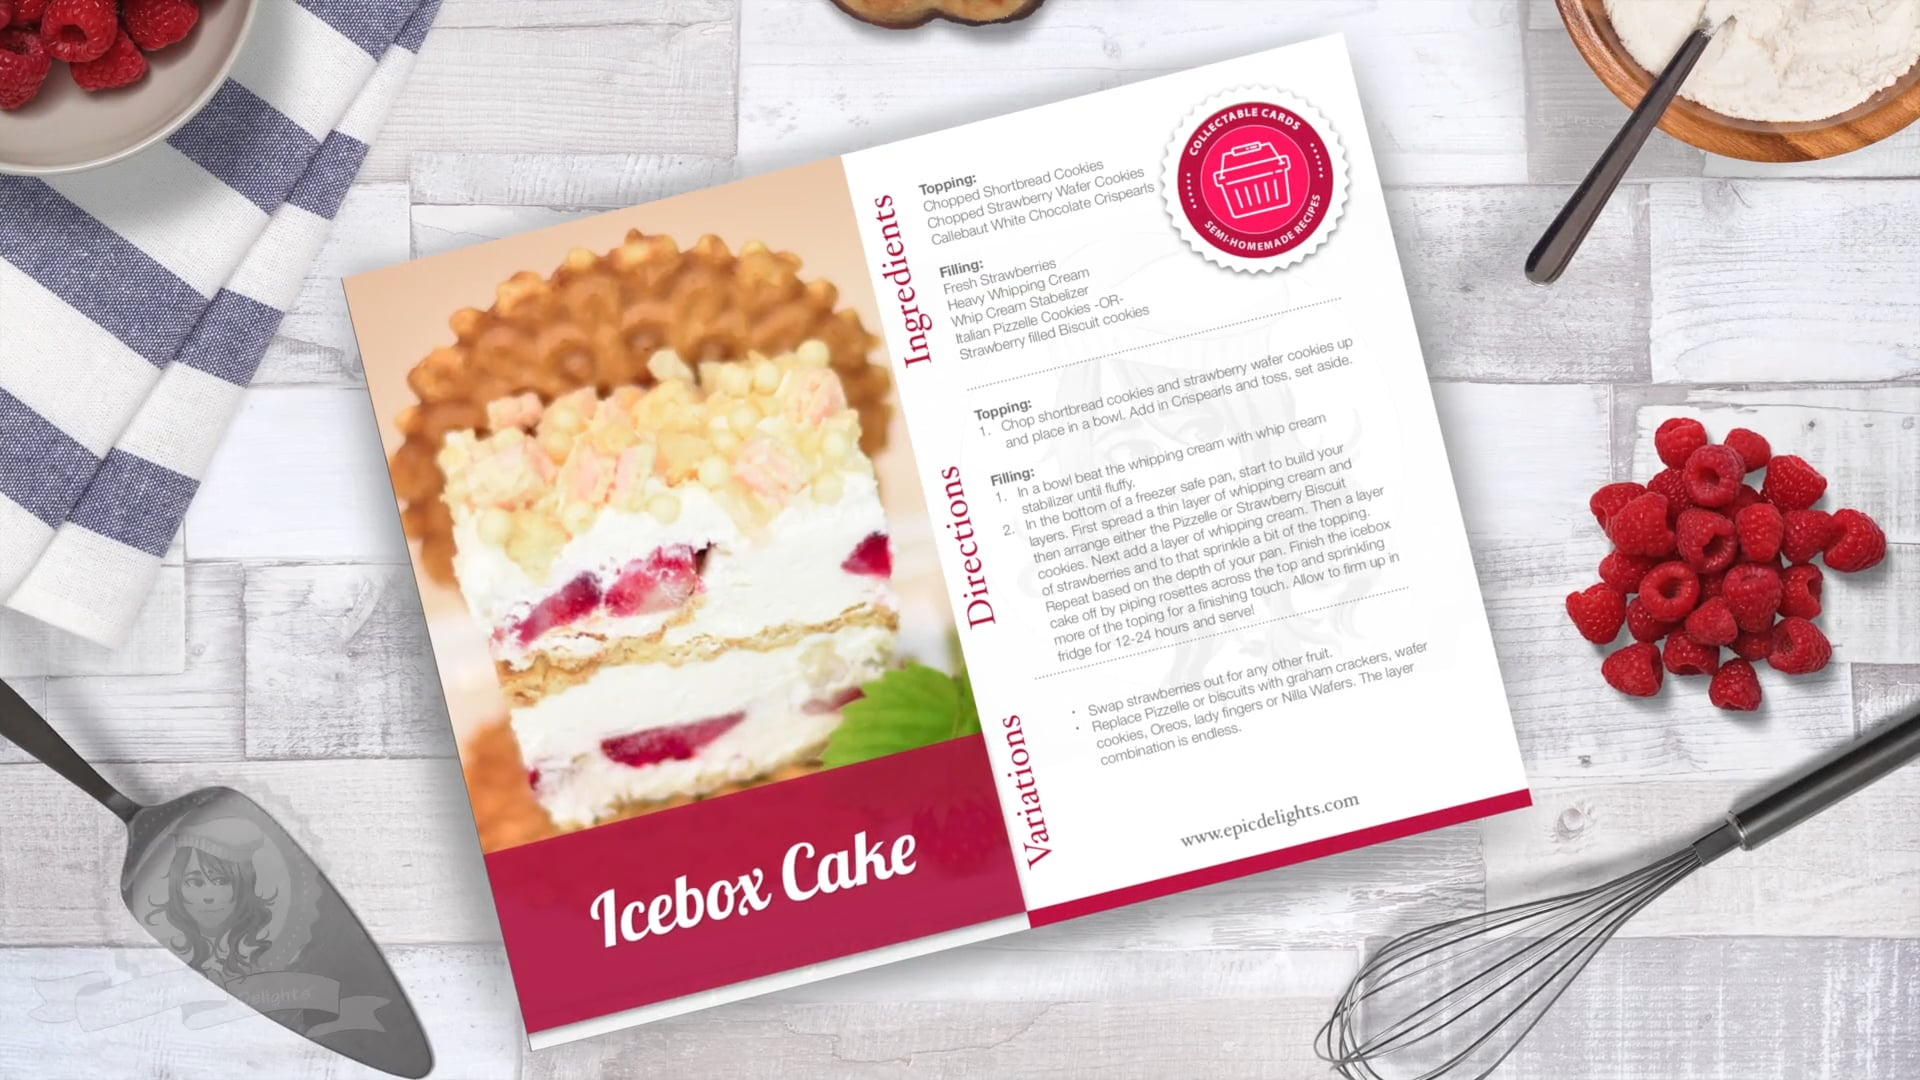 Free Video: Make a No-Bake Icebox Cake